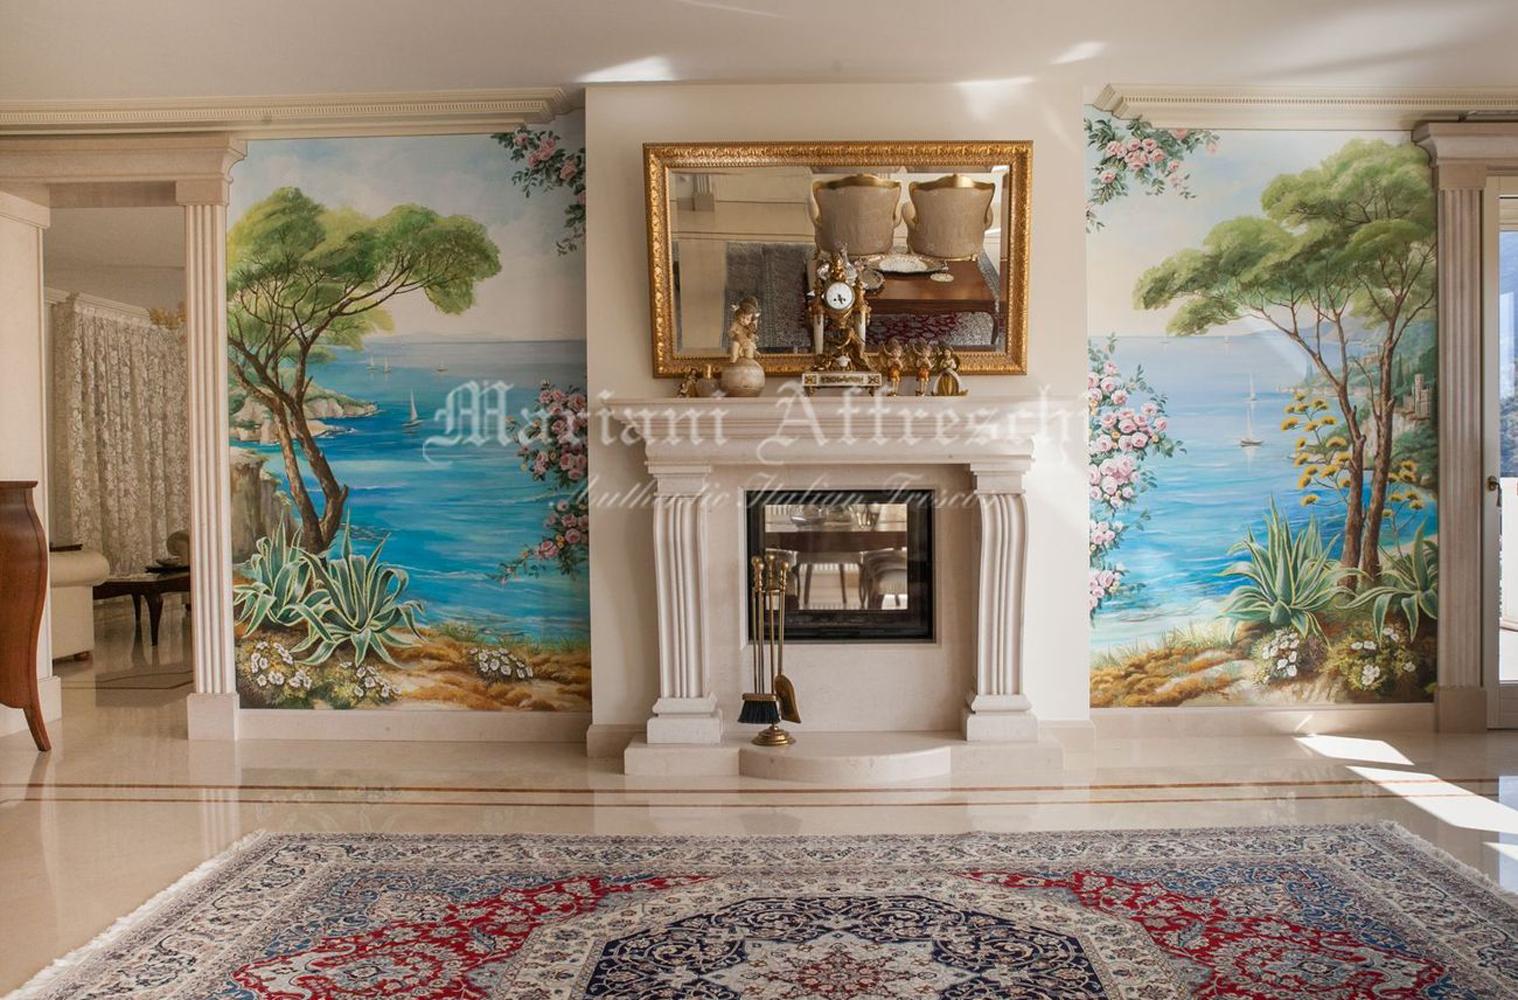 Trompe l'oeil واللوحات الجدارية الإيطالية الأصيلة